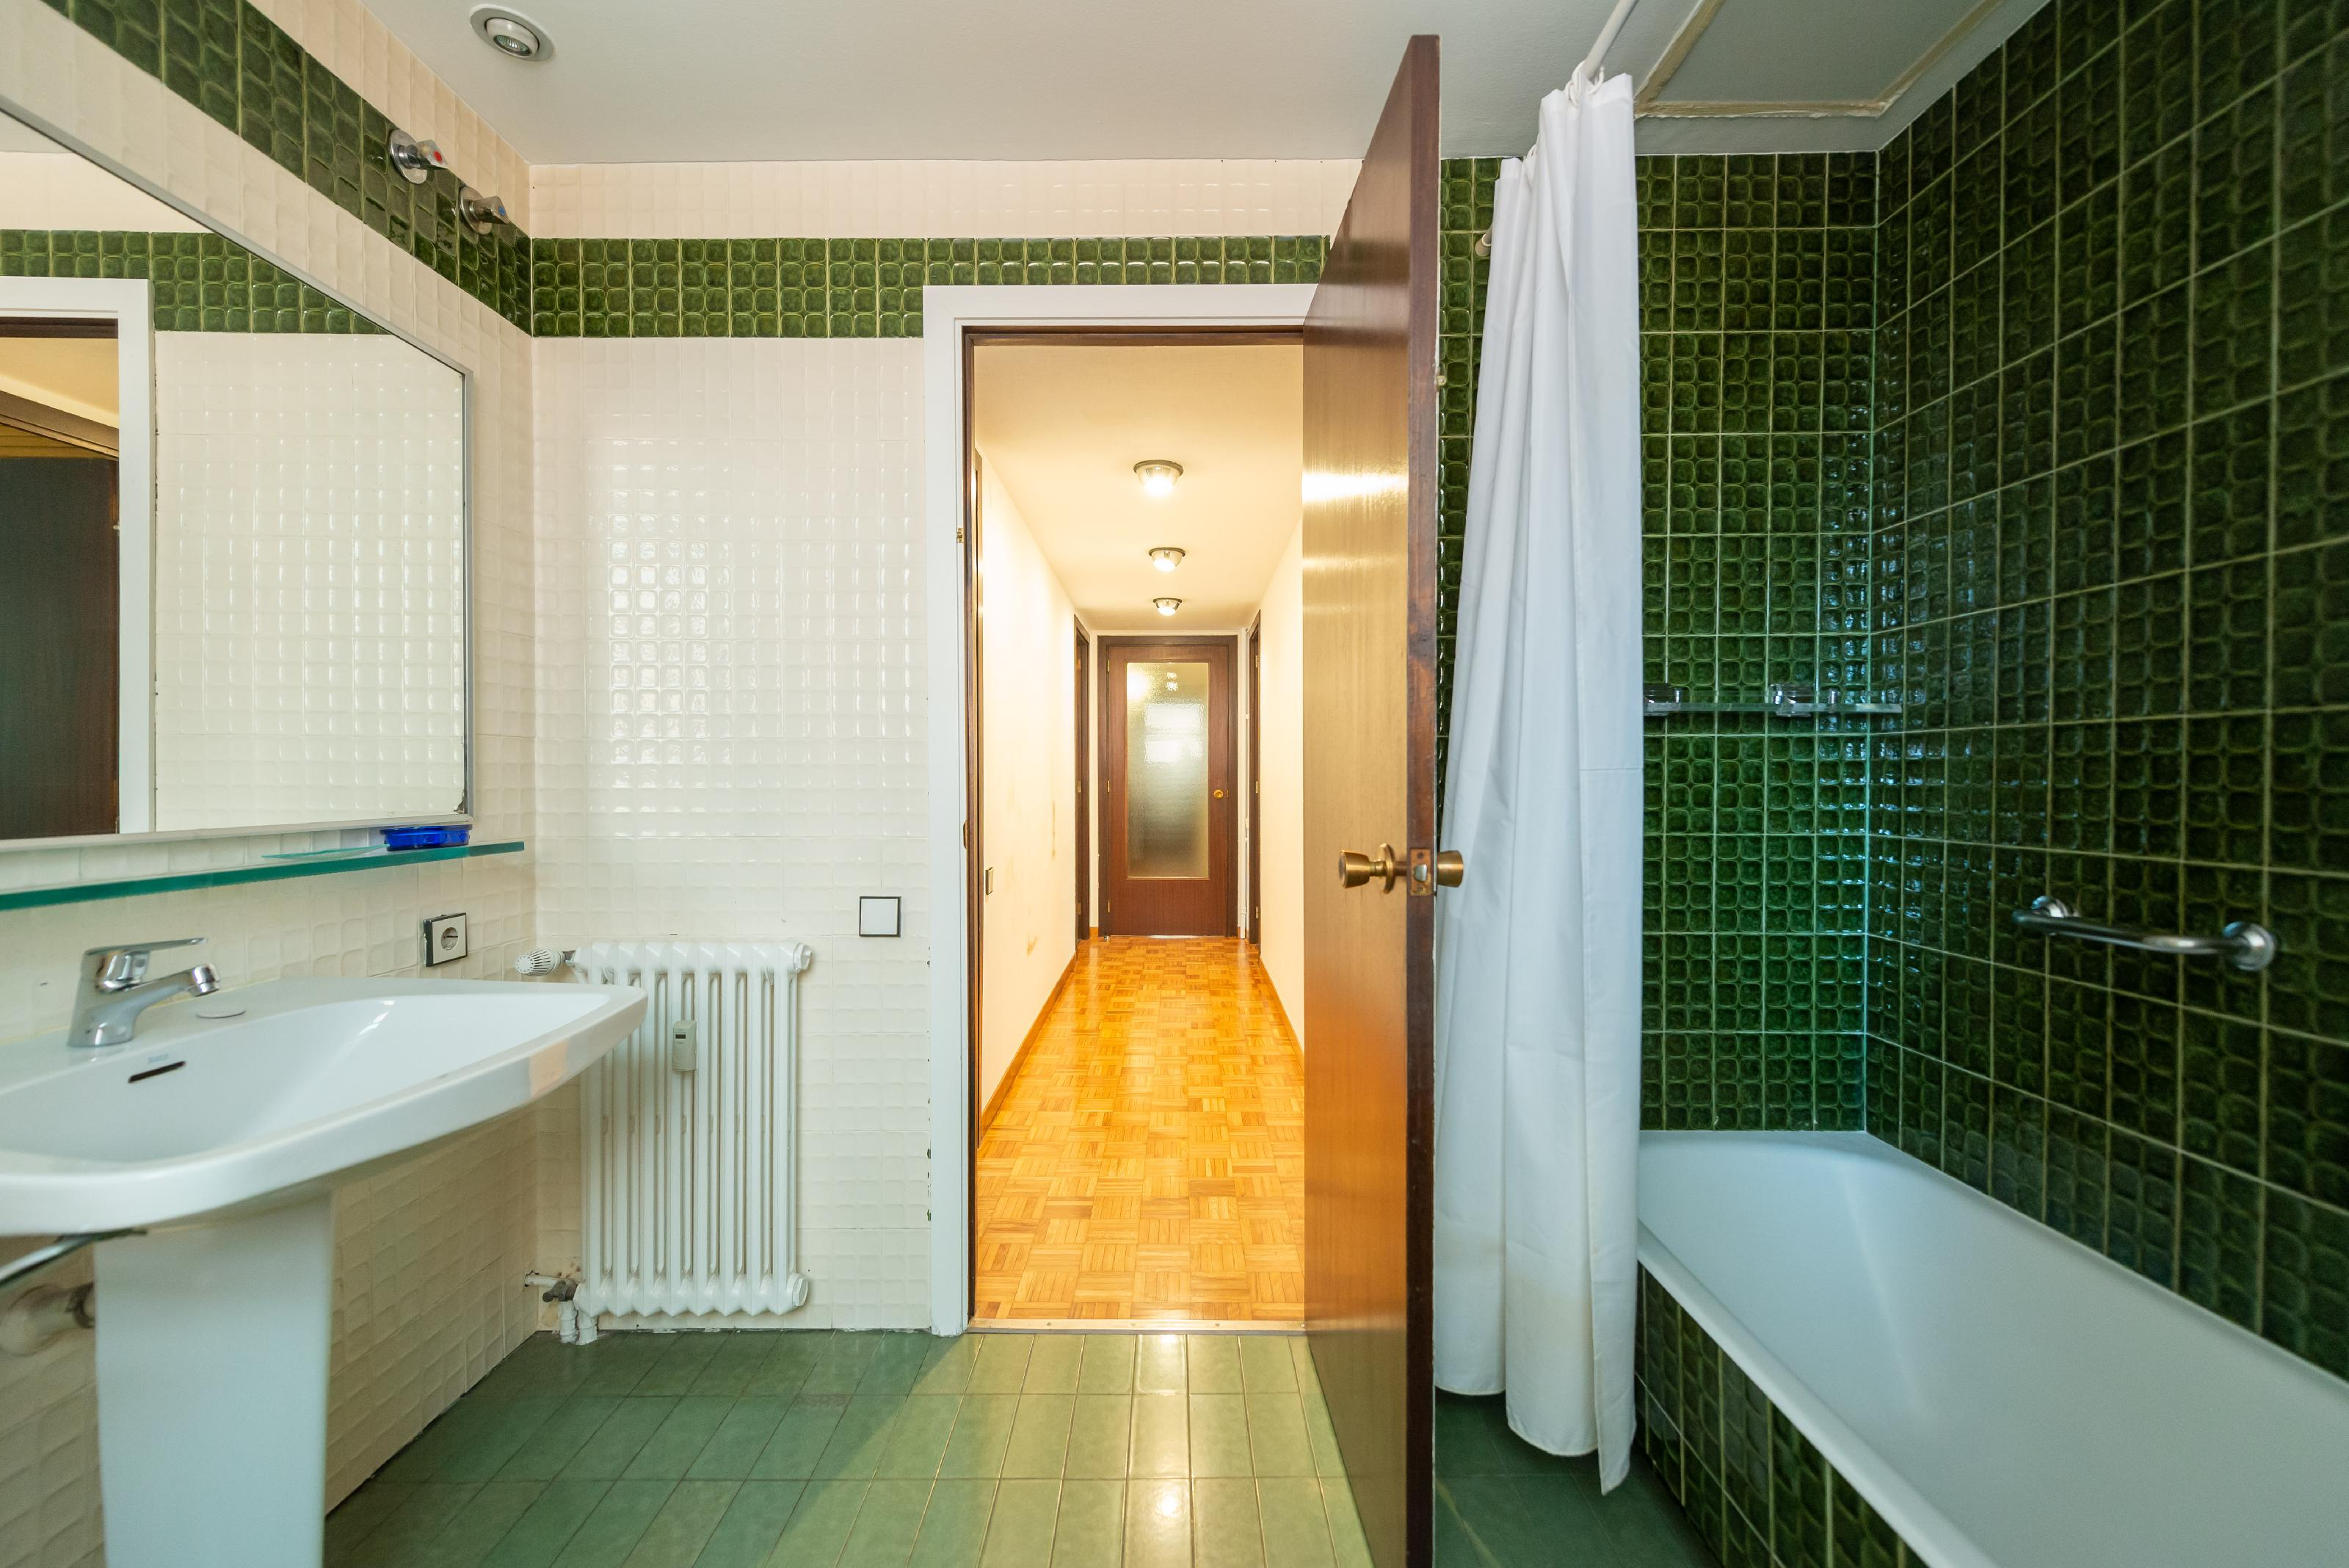 253470 Flat for sale in Sarrià-Sant Gervasi, El Putxet and Farró 17